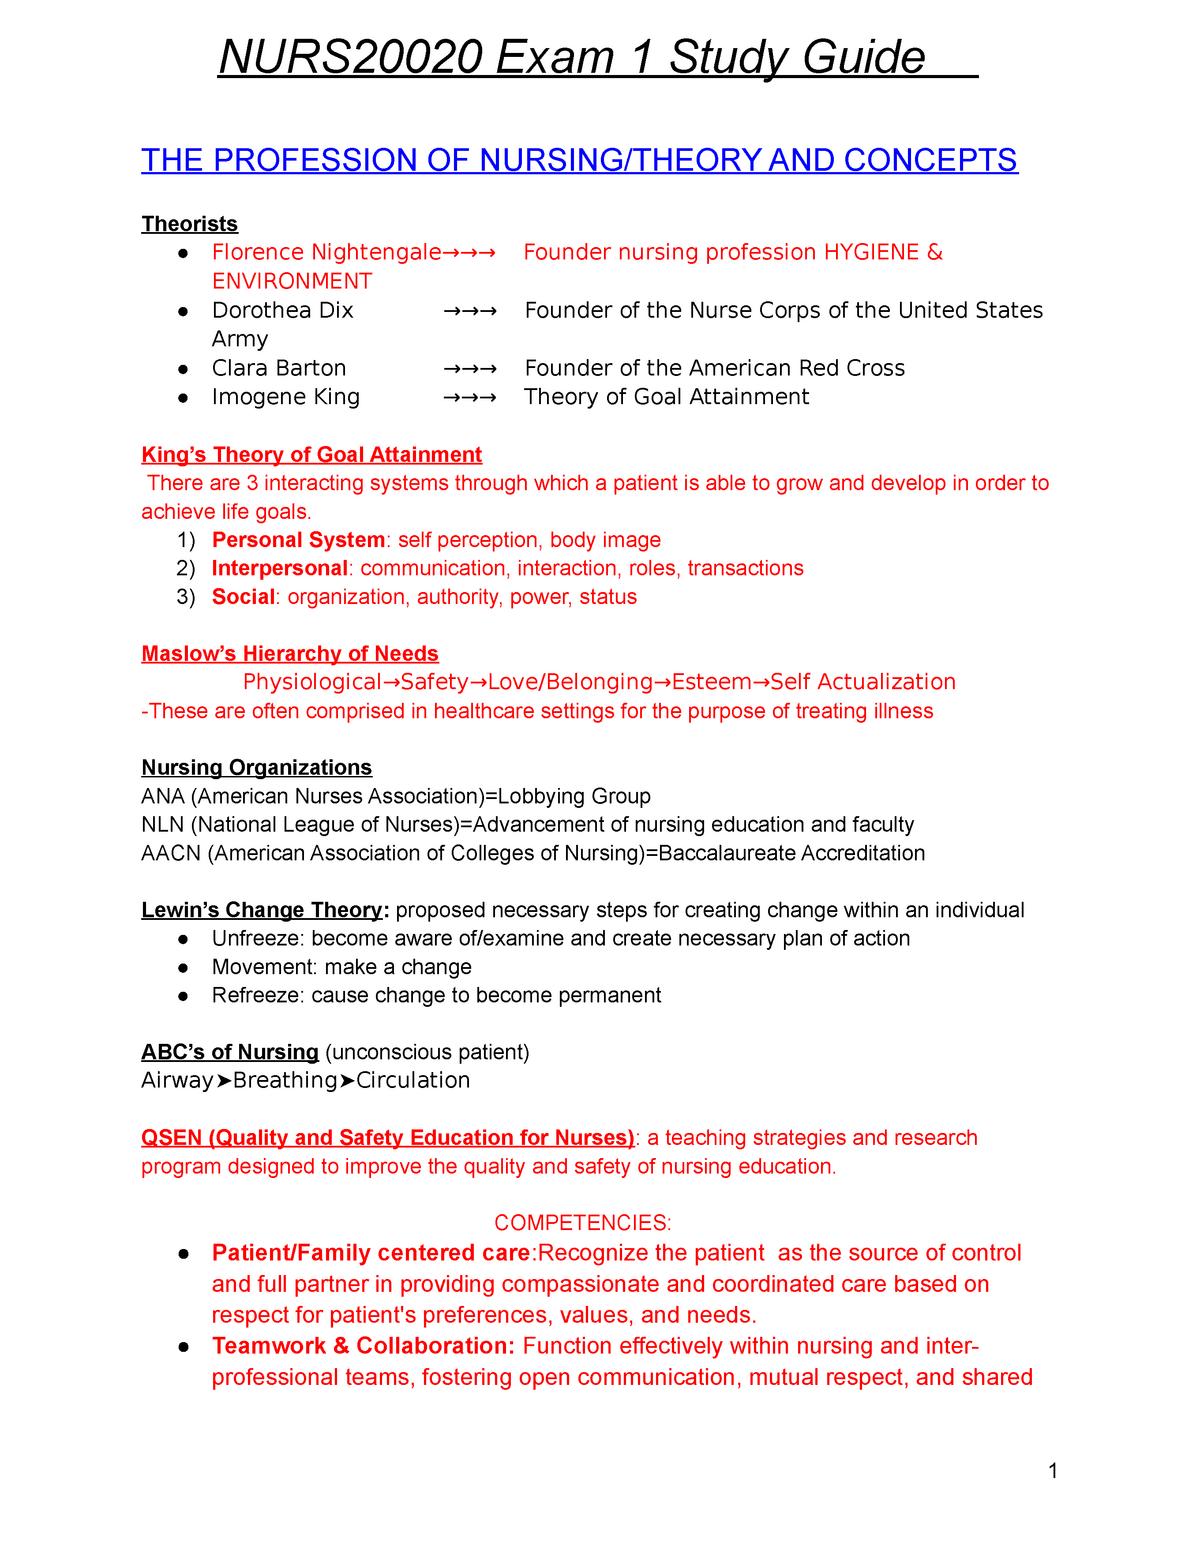 Foundations of Assessment Exam 1 Study Guide NURS 20020